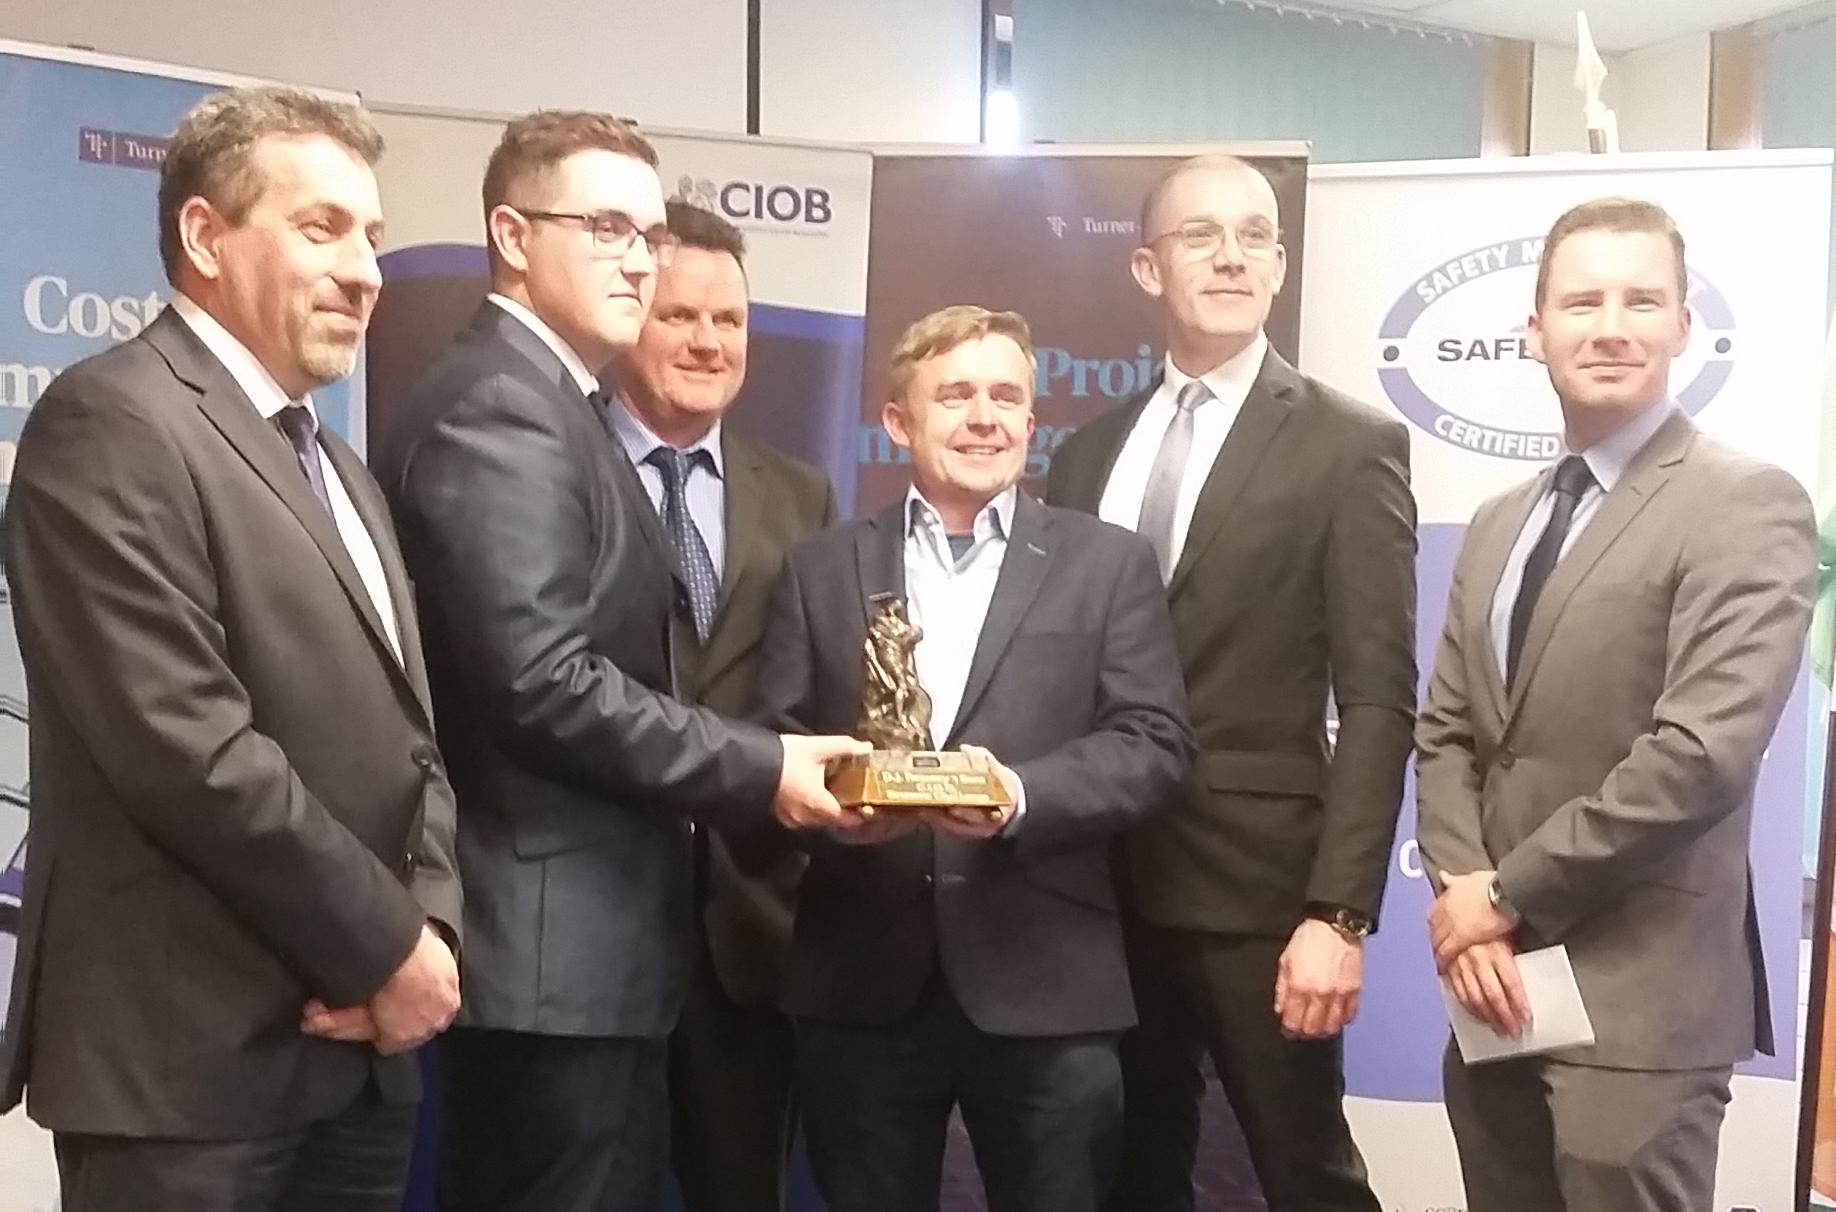 CIOB Student Challenge Ireland Award 2016